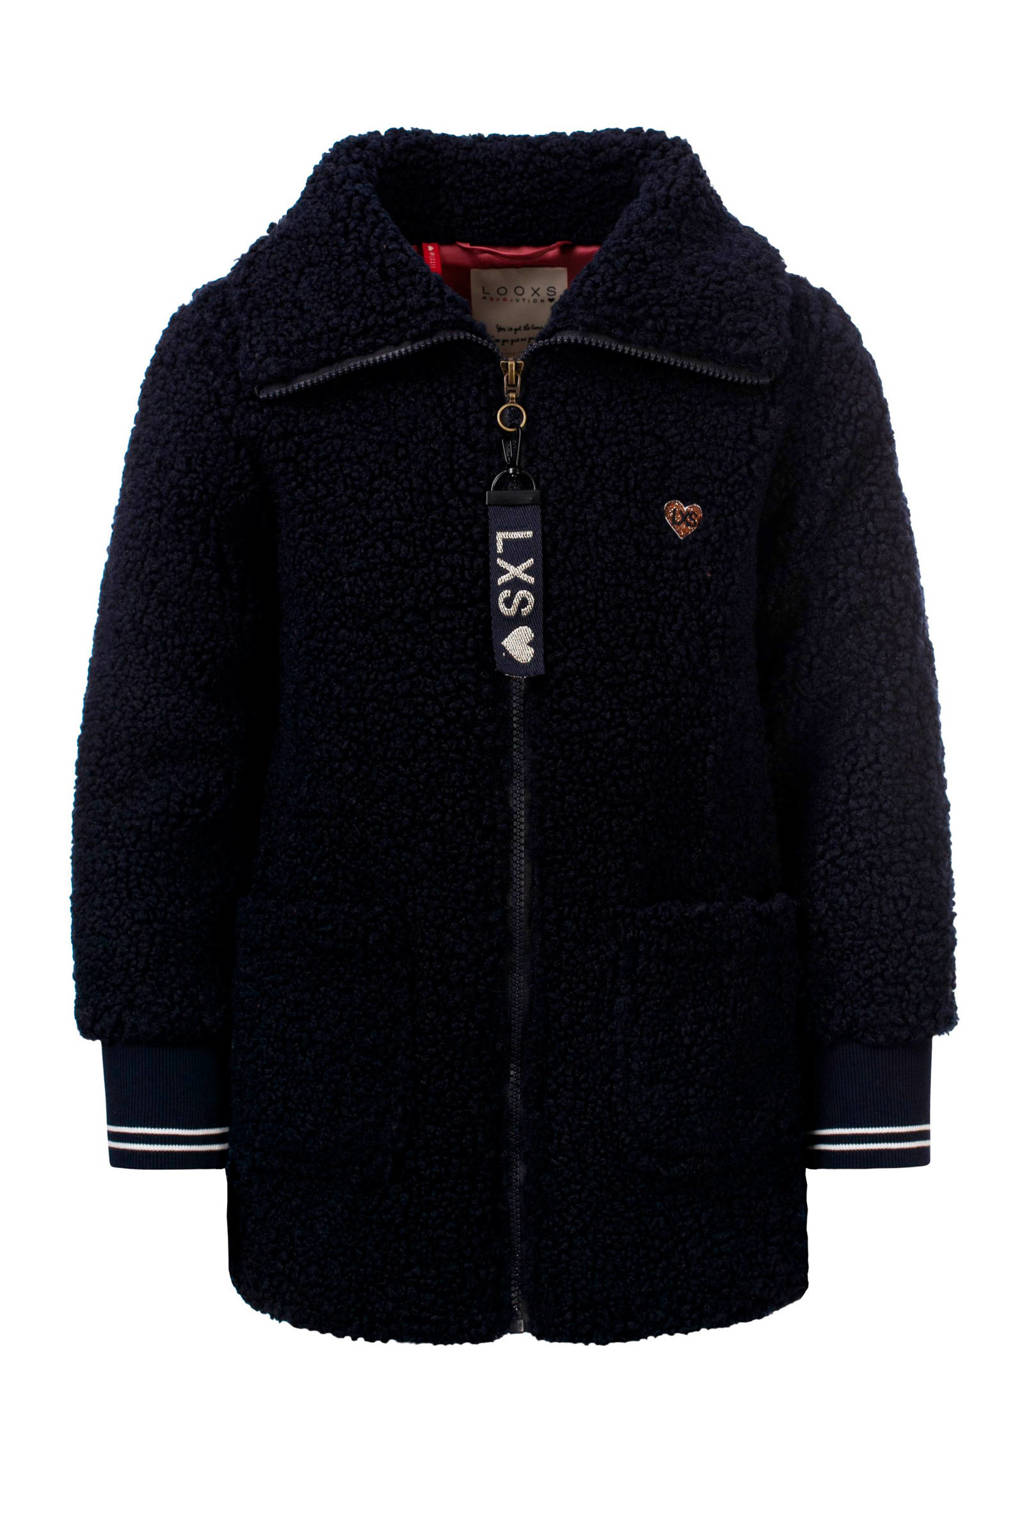 LOOXS little teddy winterjas donkerblauw, Donkerblauw